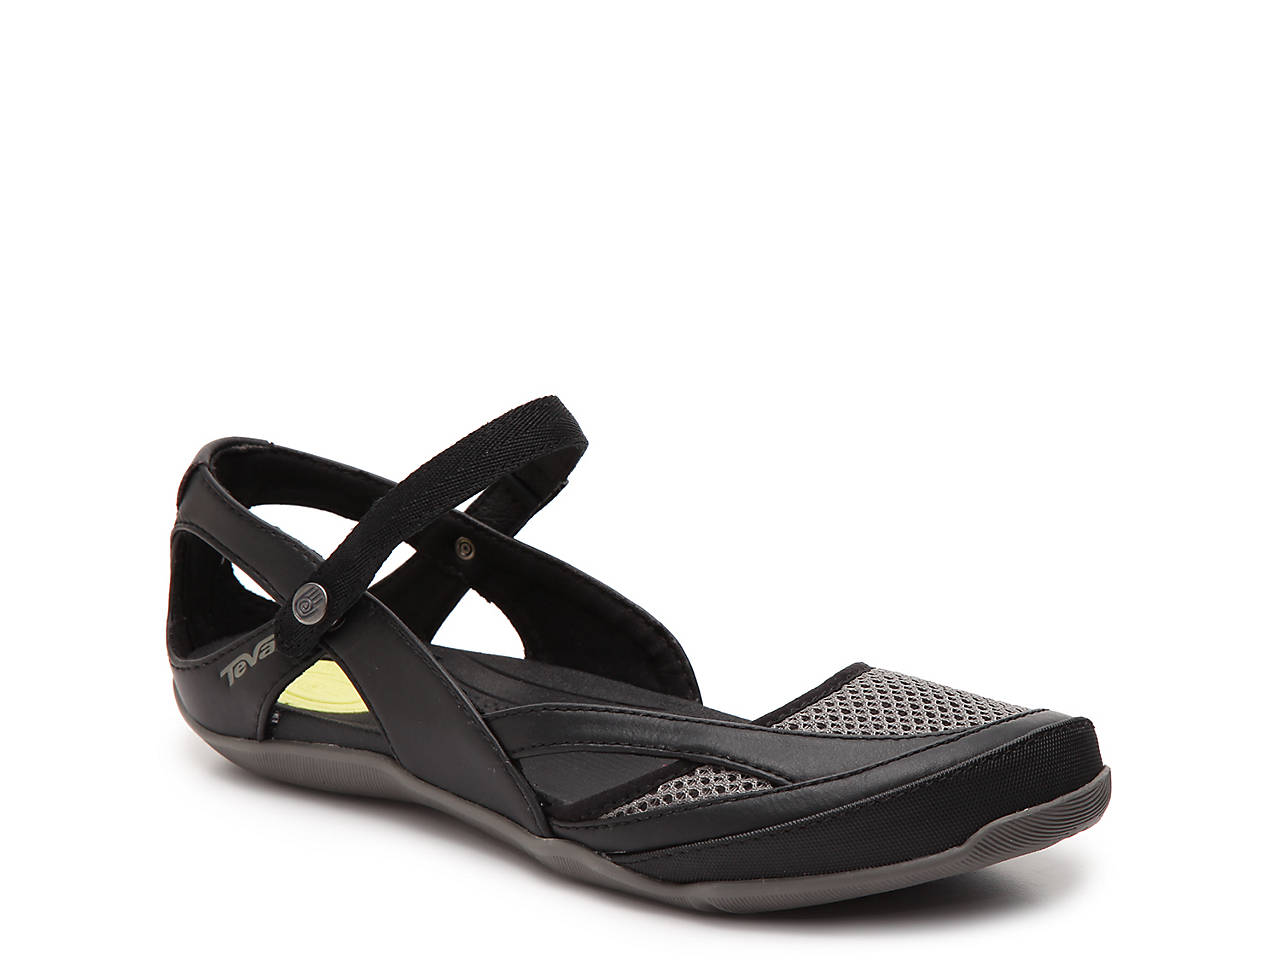 ad1f7588aeaf Teva Northwater Sport Flat Women s Shoes